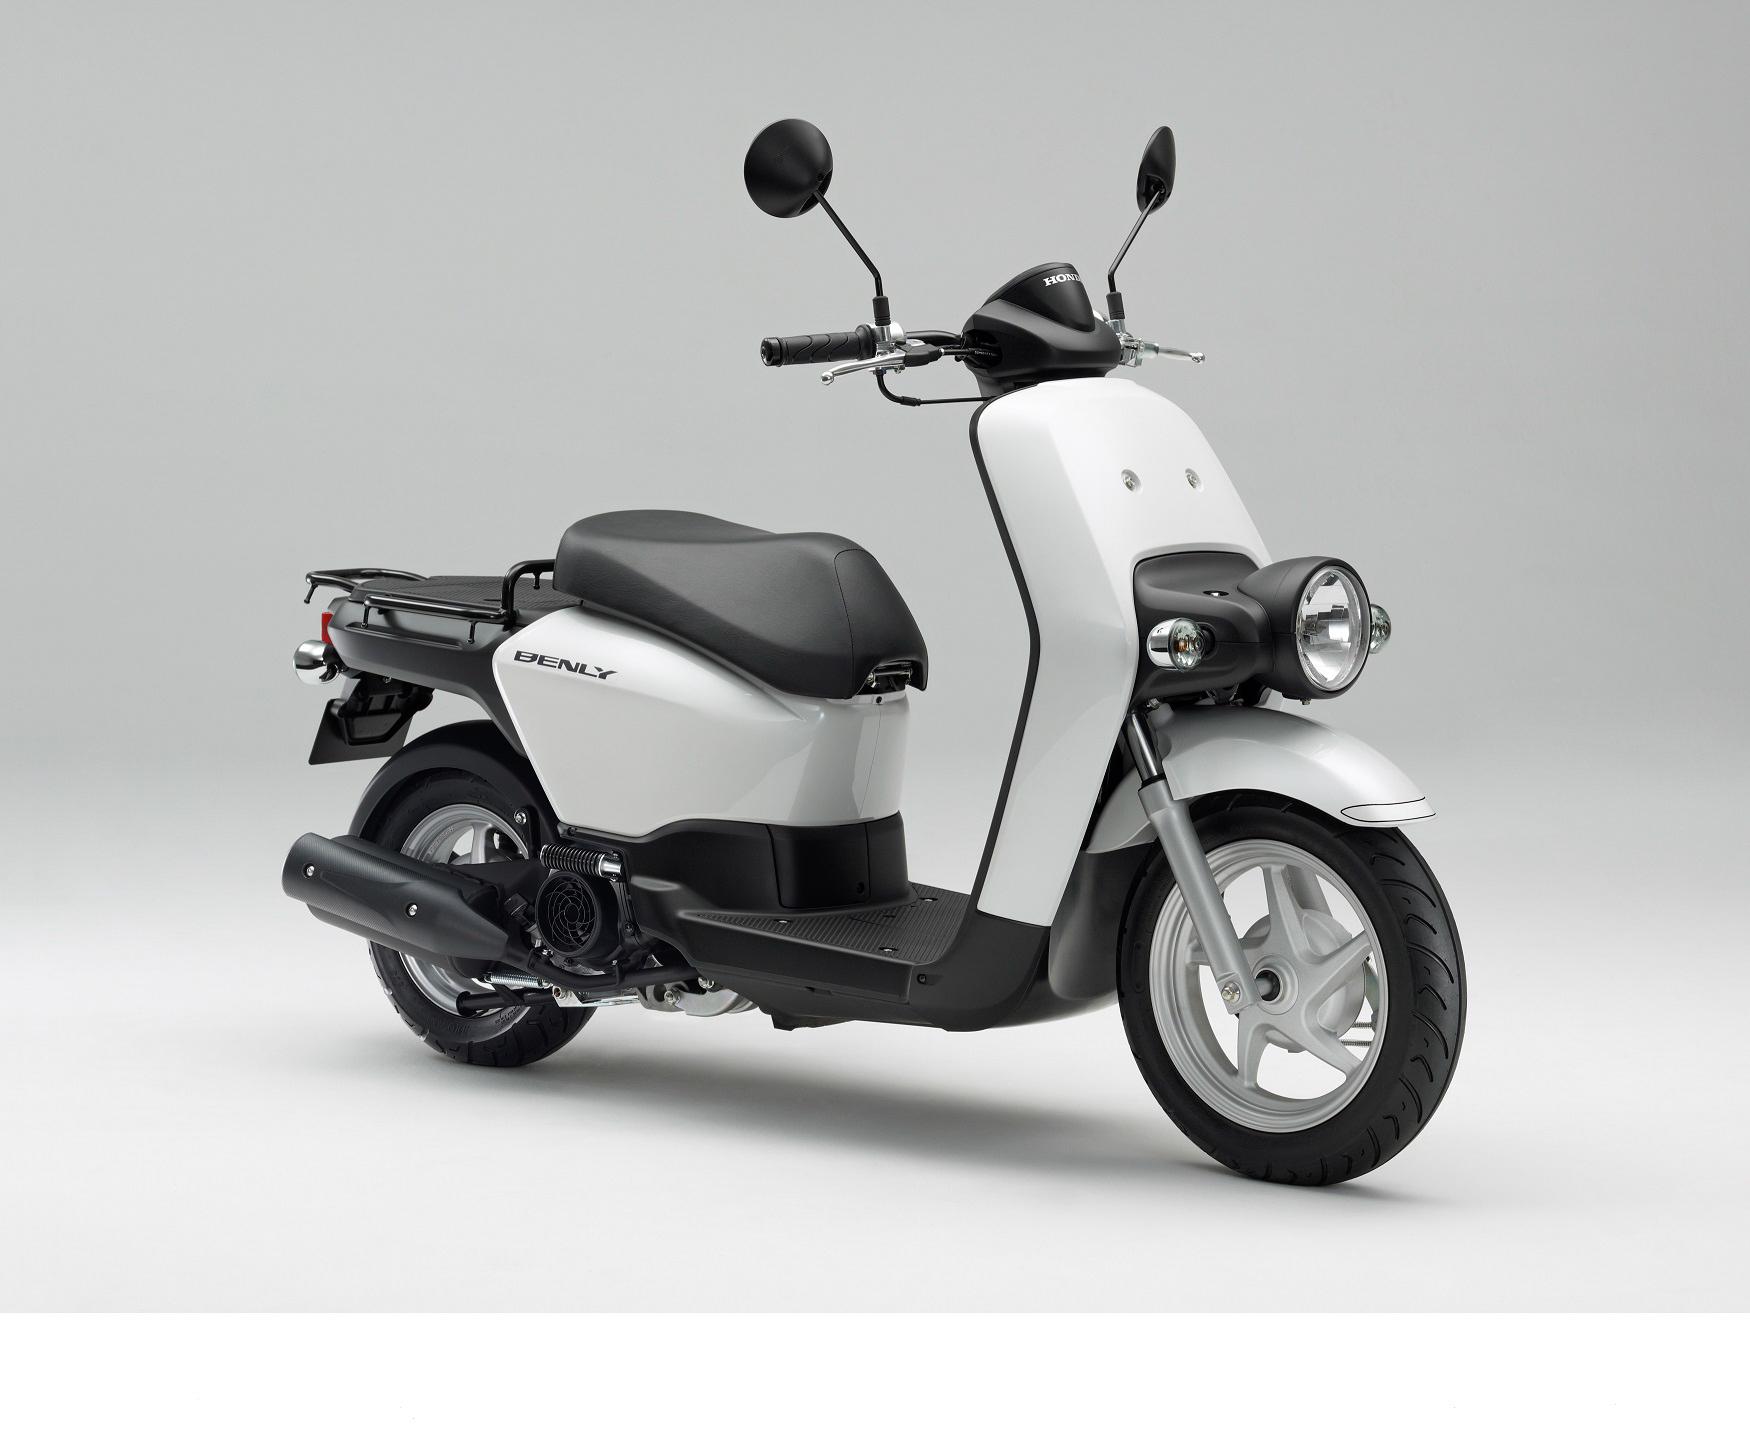 honda scooter sale bike review